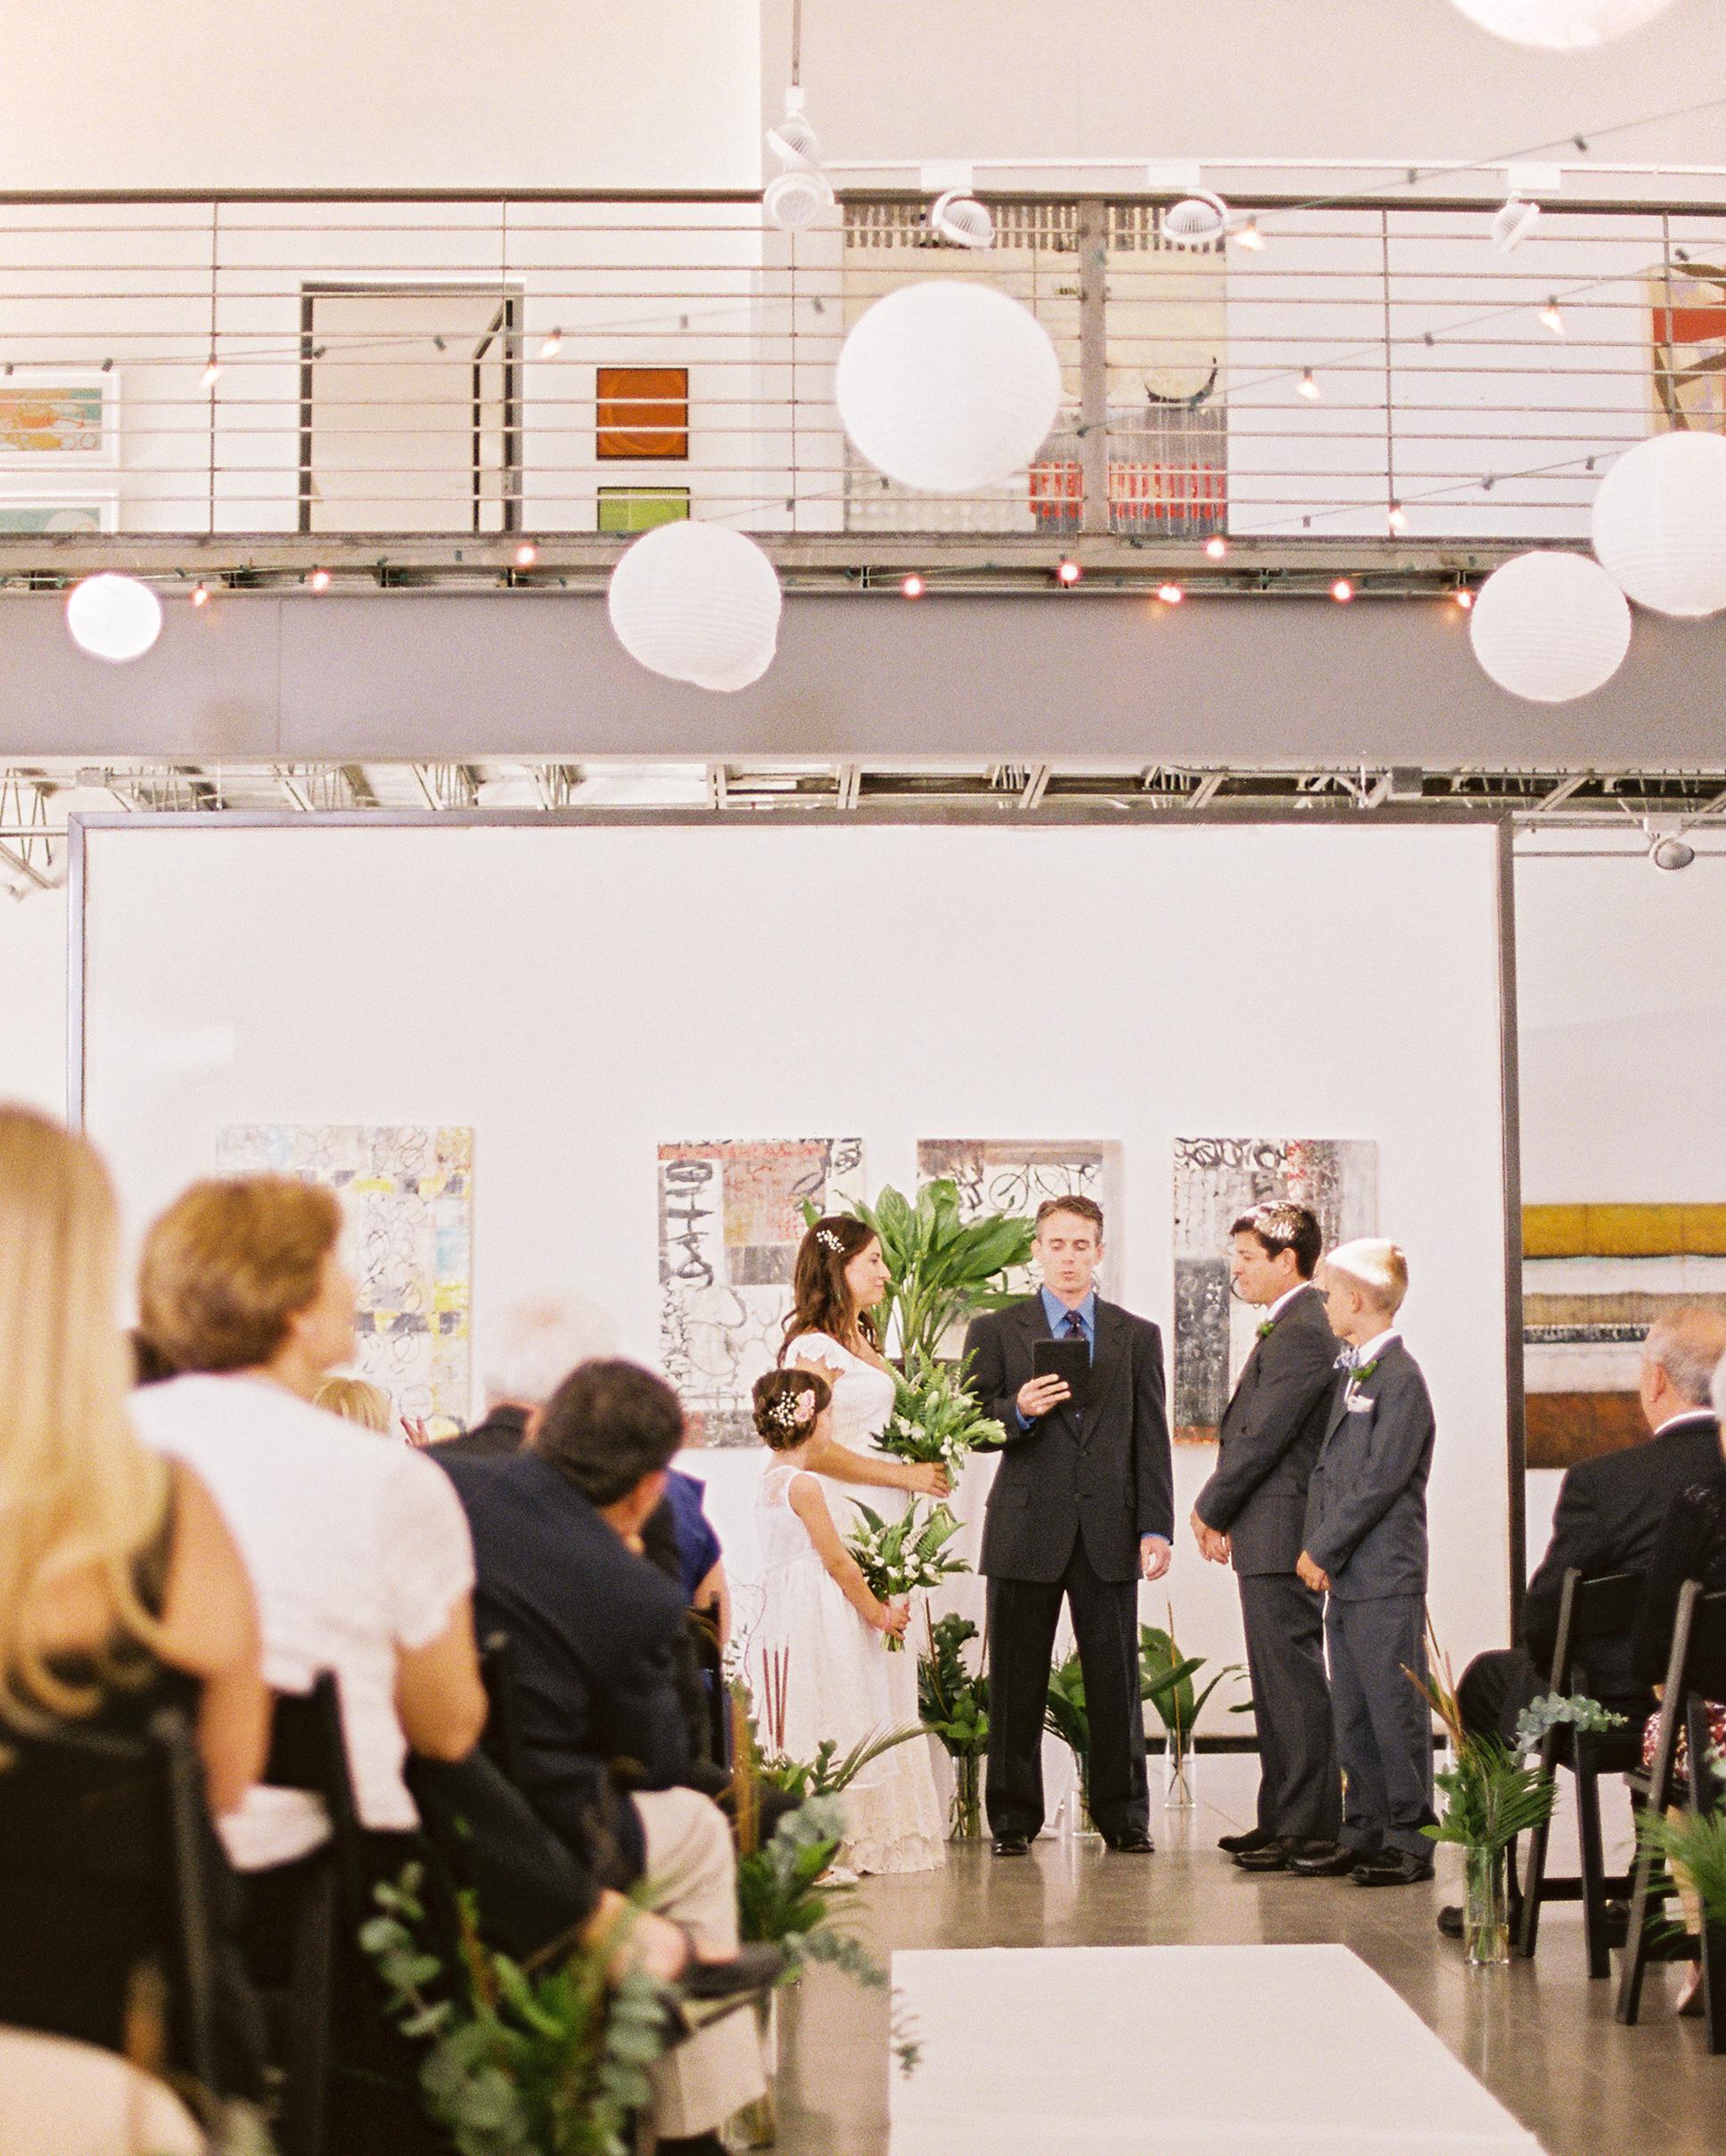 sydney-mike-wedding-ceremony-50-s111778-0215.jpg